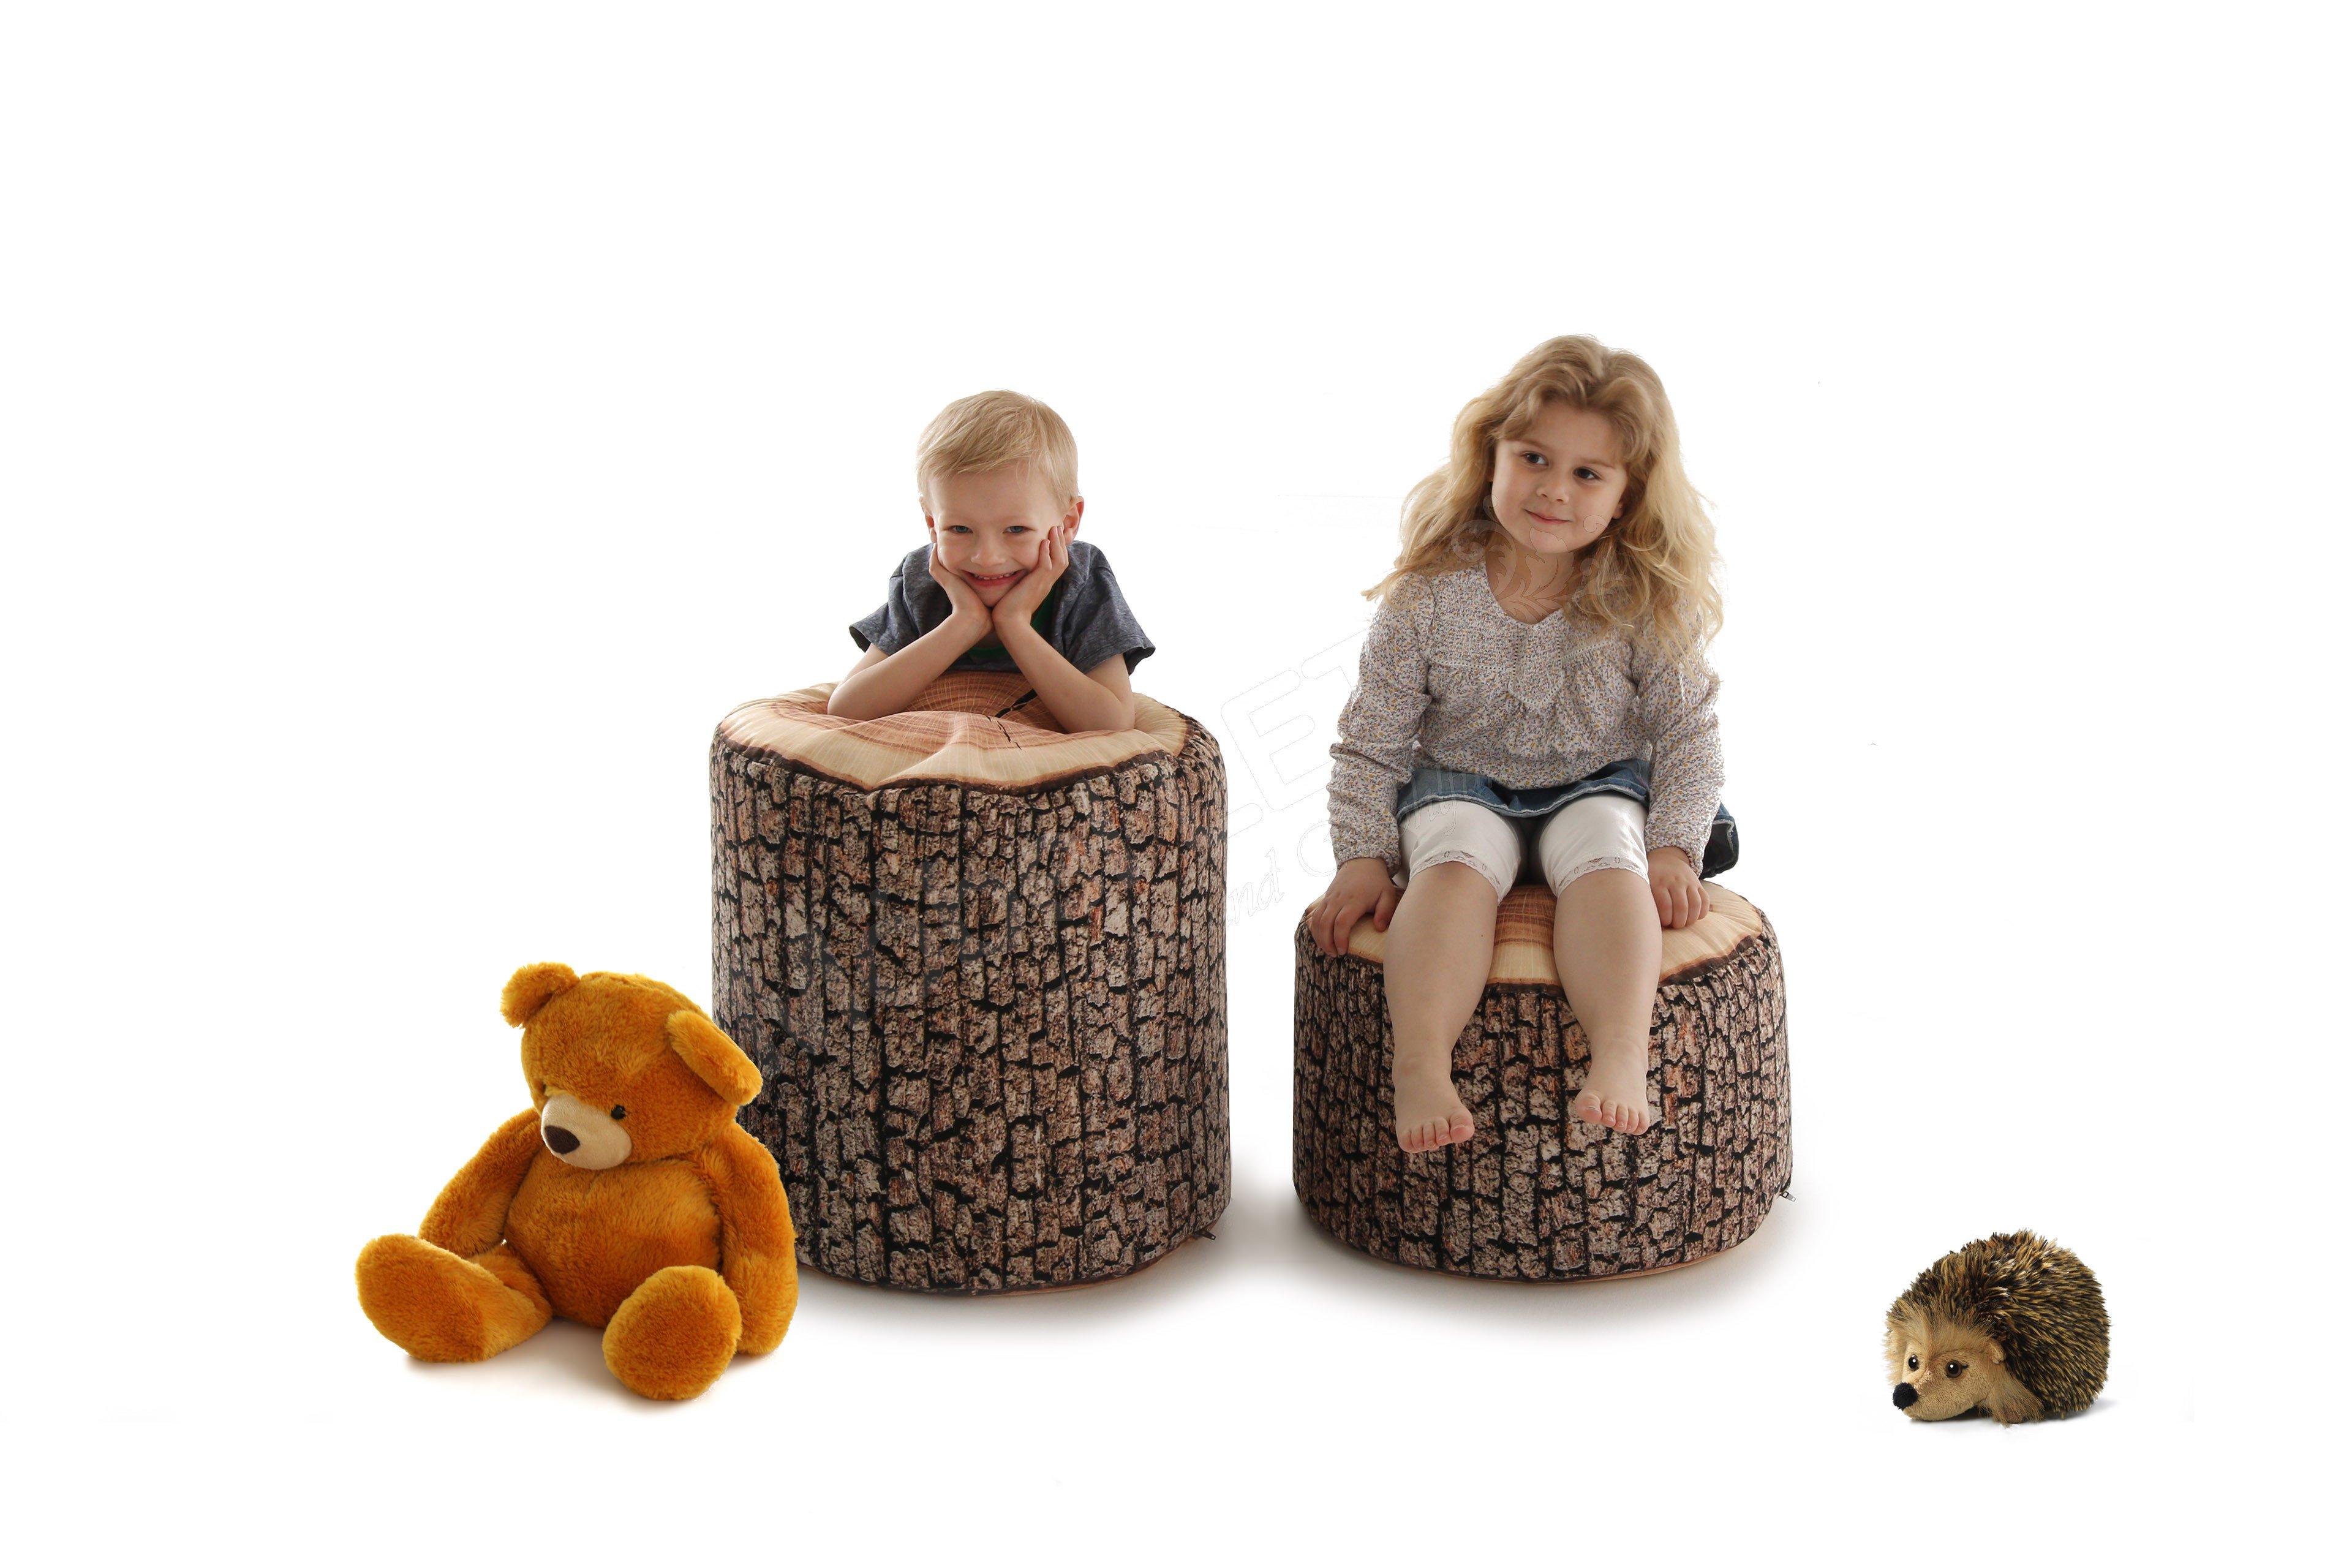 sitzsack selber machen sitzsack selber machen in ein paar. Black Bedroom Furniture Sets. Home Design Ideas